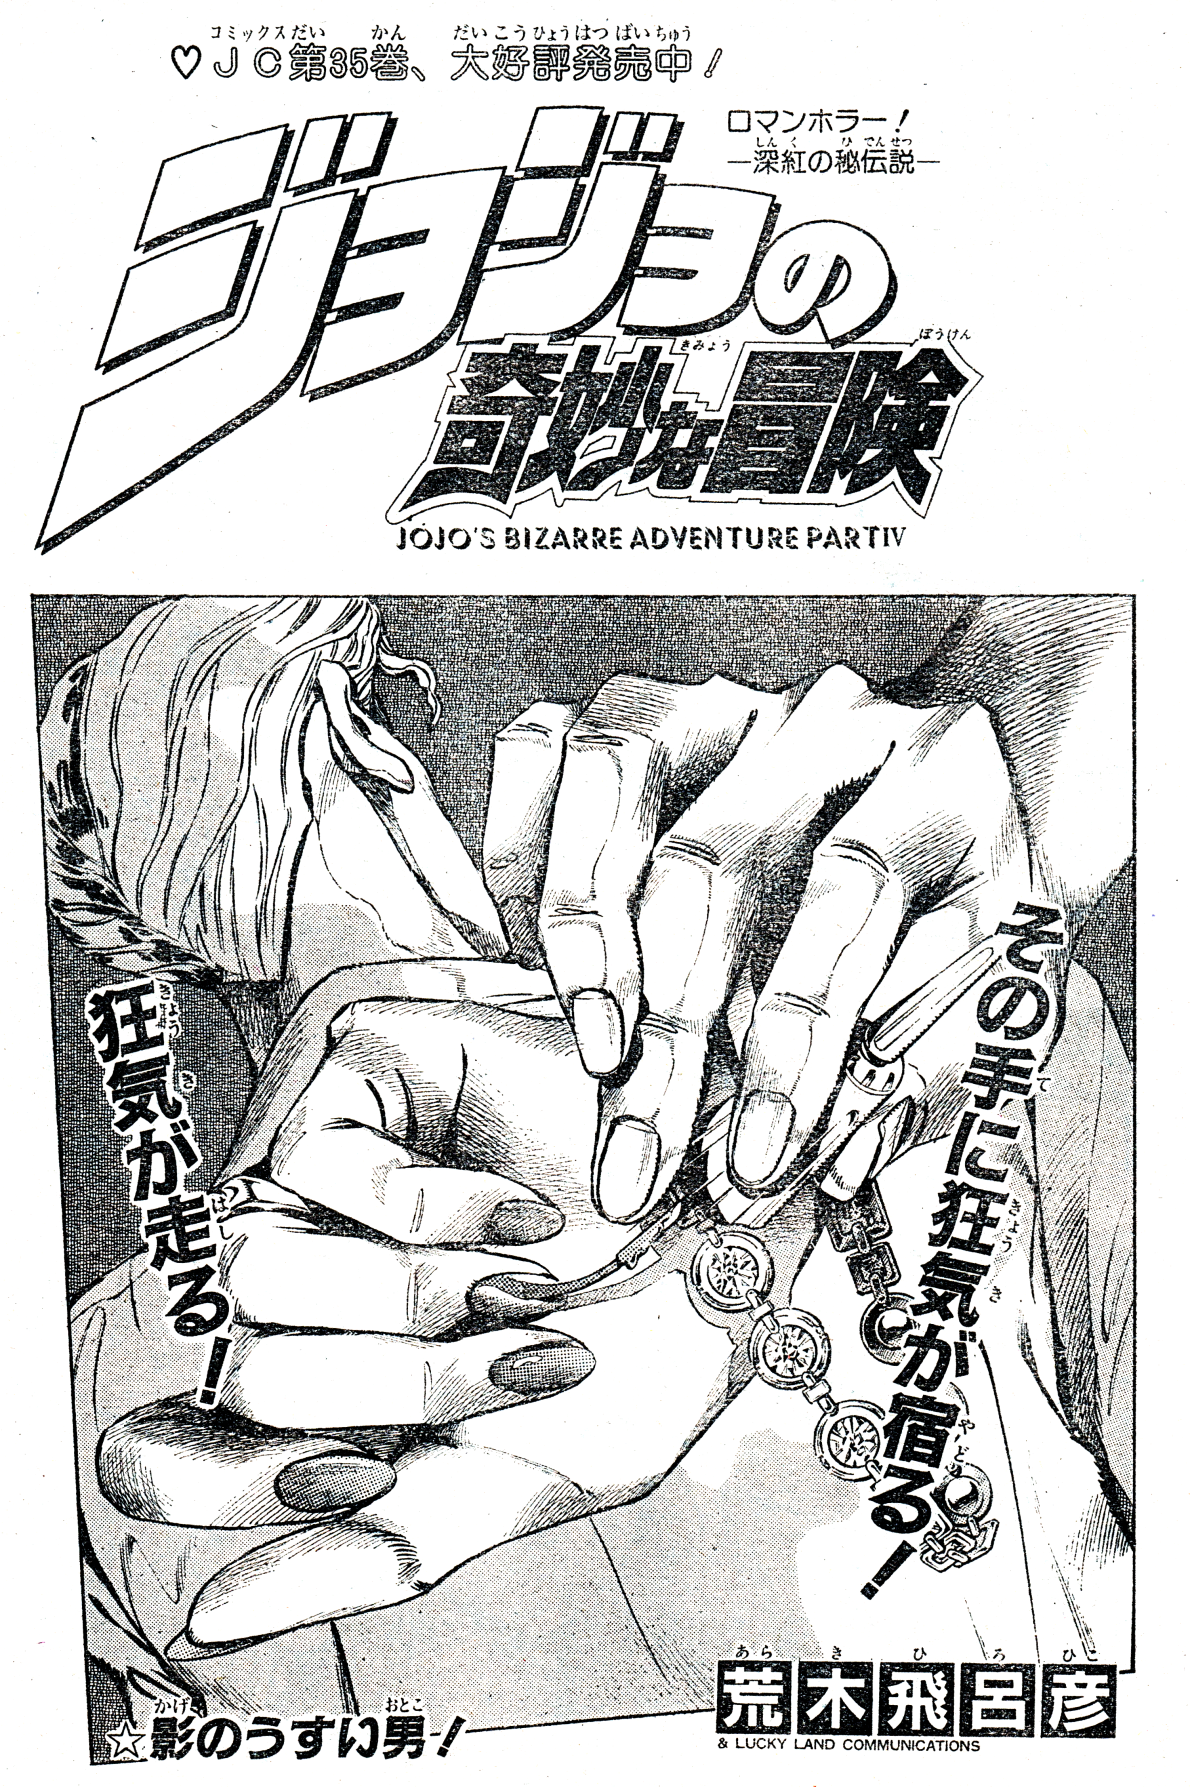 DU Chapter 77 Magazine.png